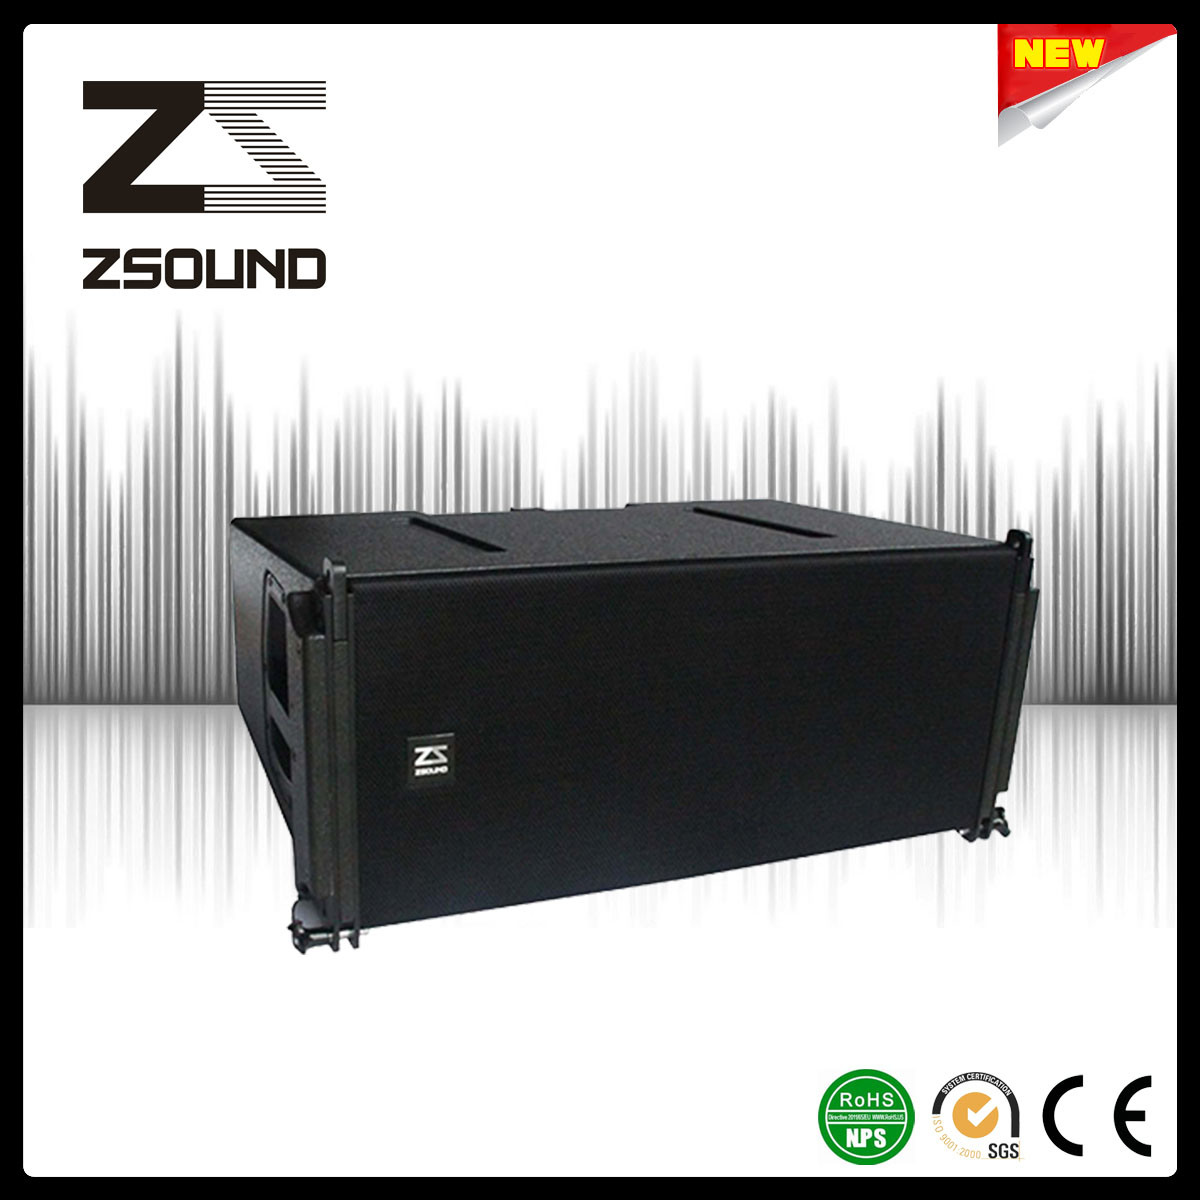 Dual 12 Inch Tri-AMP Neodymium Touring Performance Line Array Speaker